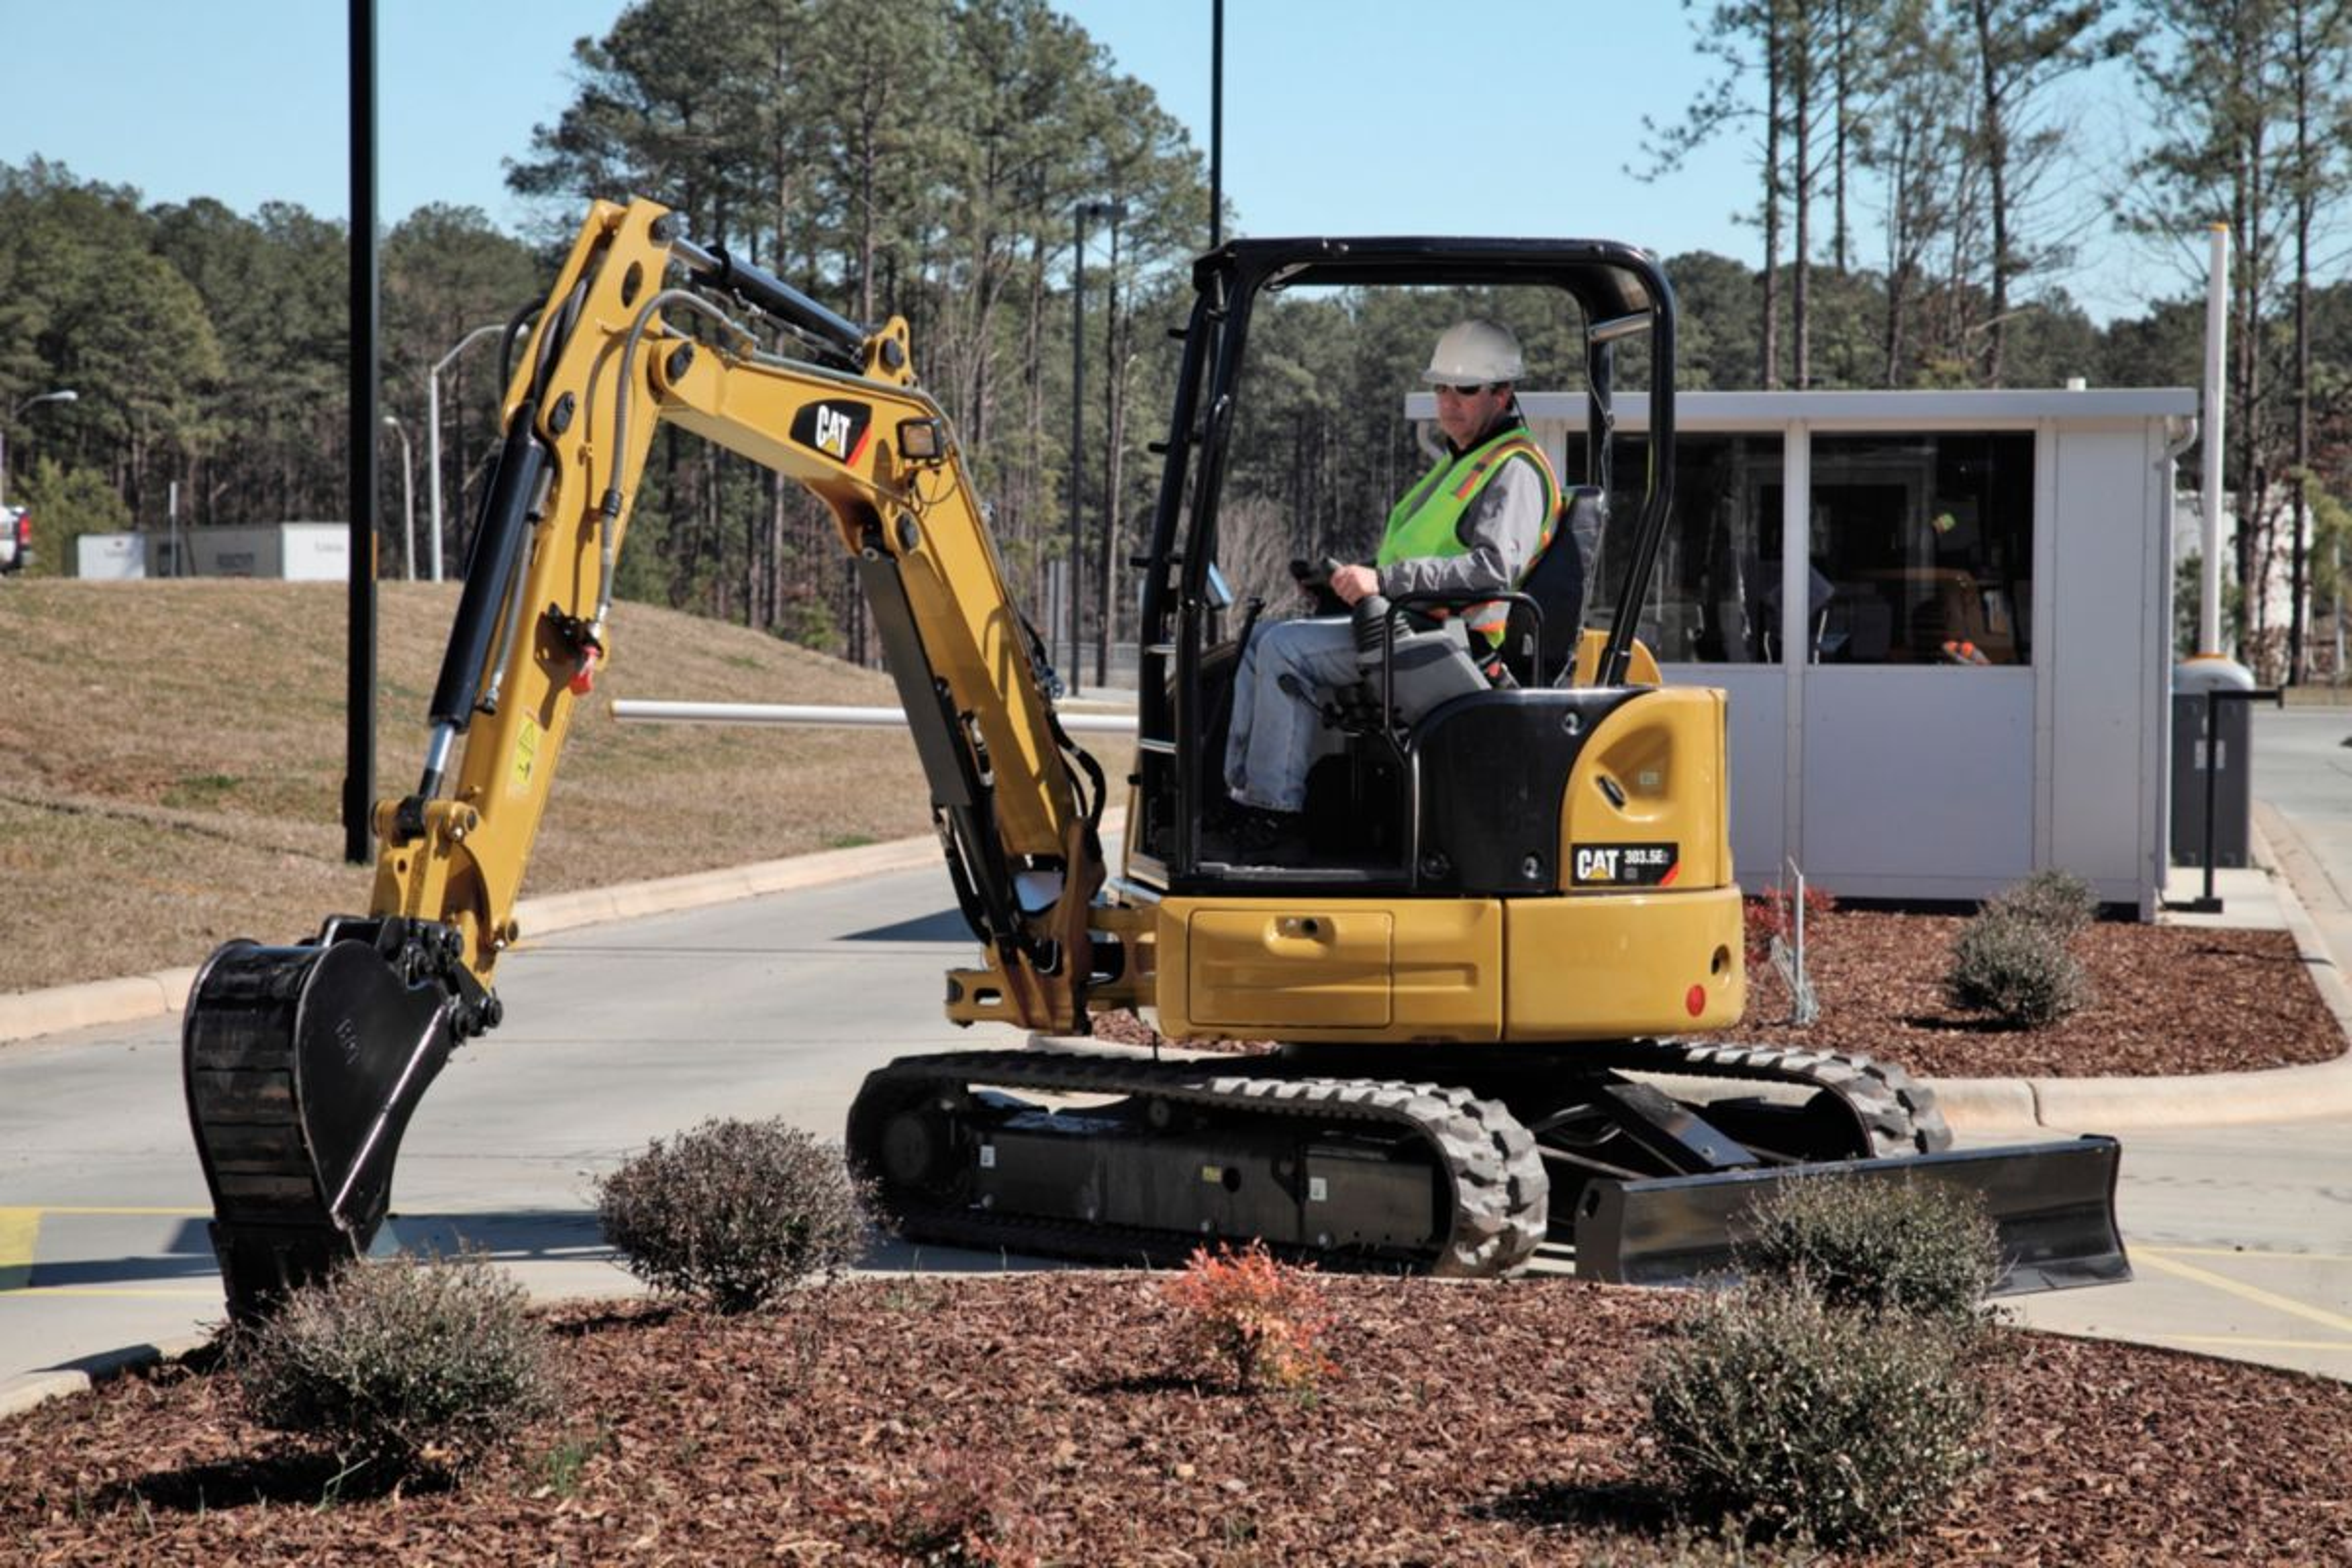 303.5E2 CR Mini Excavator